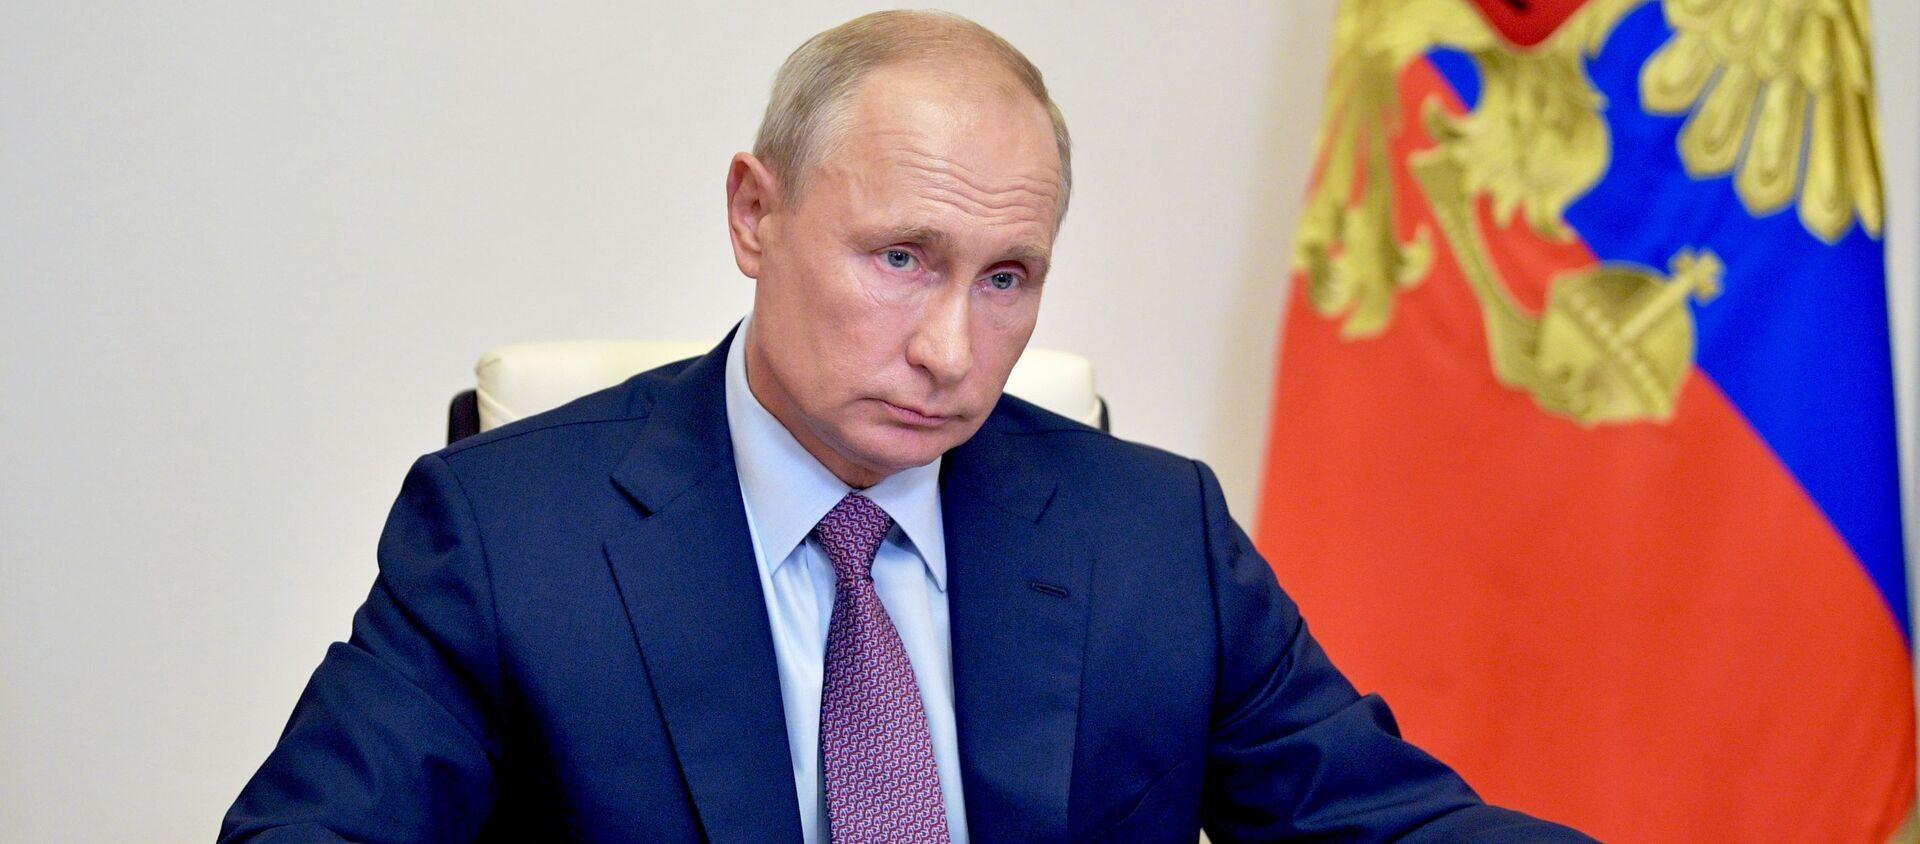 Vladímir Putin, presidente de Rusia - Sputnik Mundo, 1920, 22.10.2020